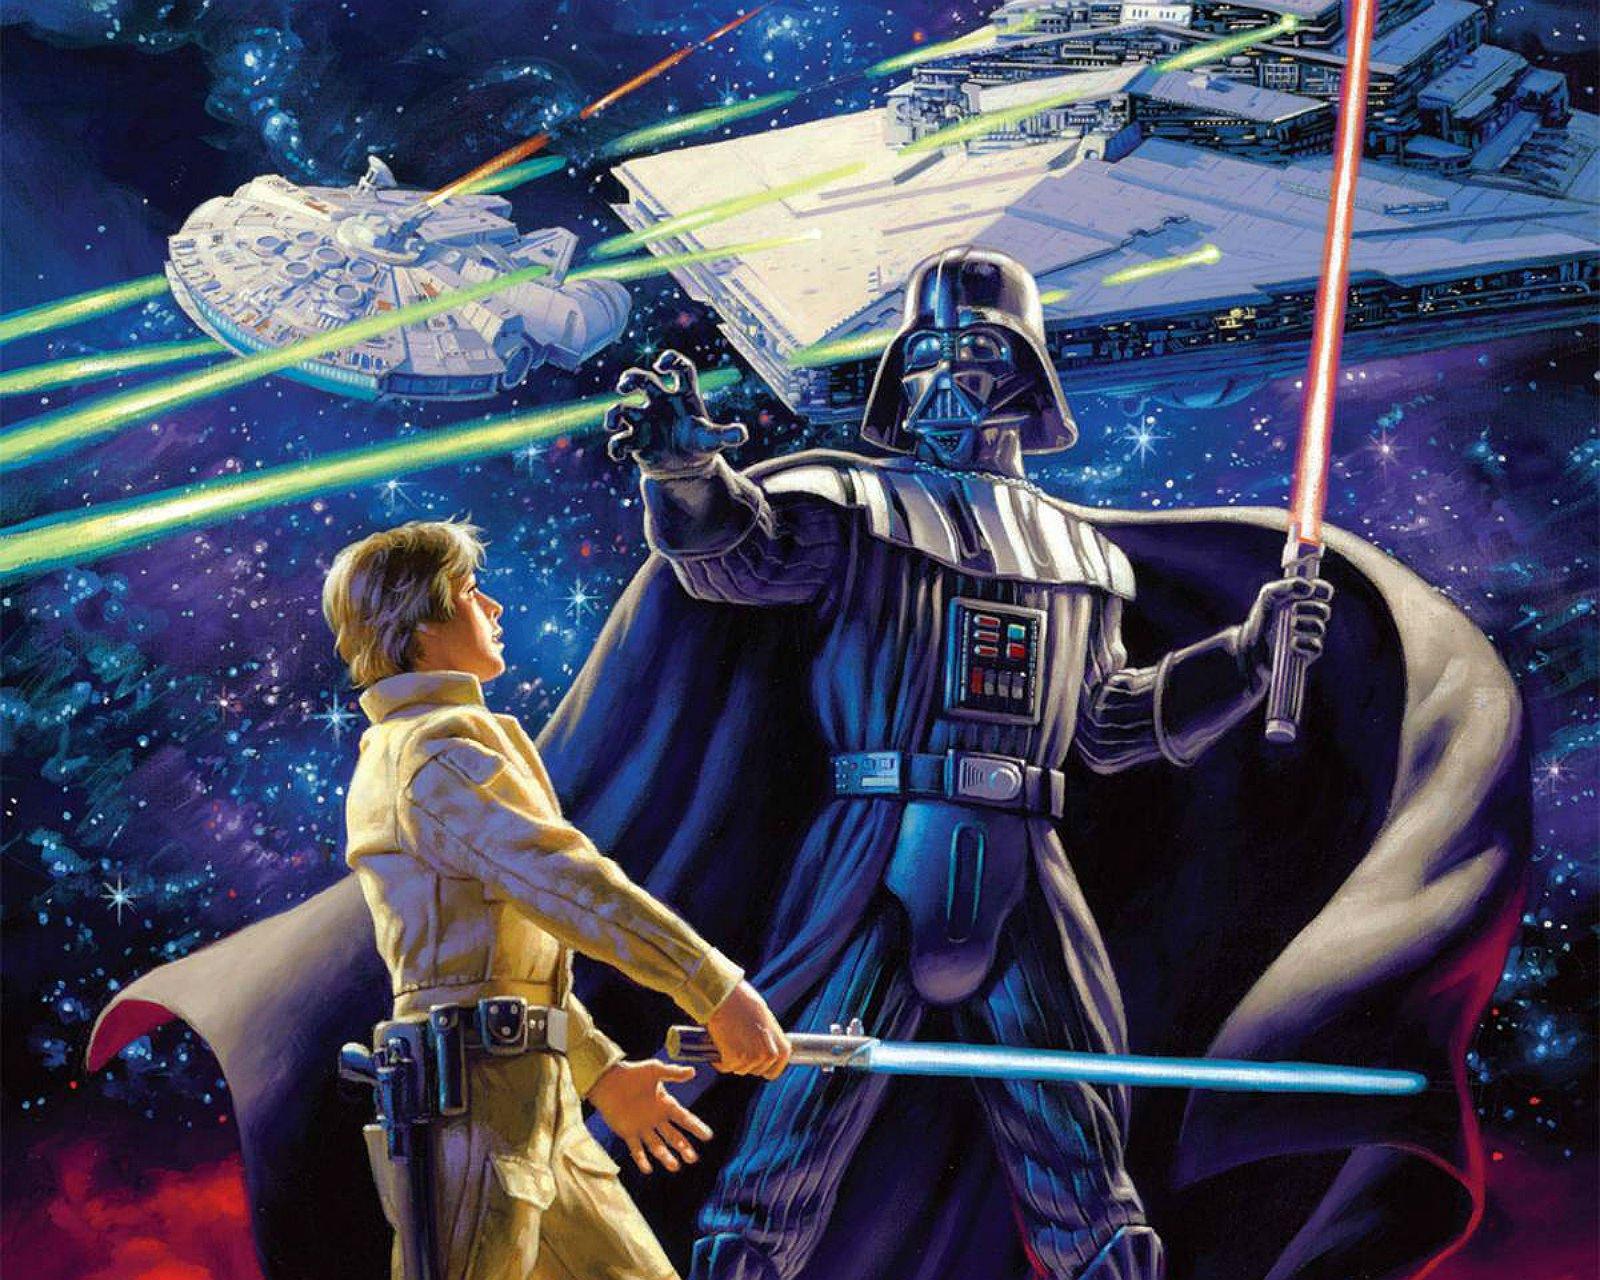 Marvel Star Wars Sci Fi Futuristic Action Comics Adventure Wallpaper